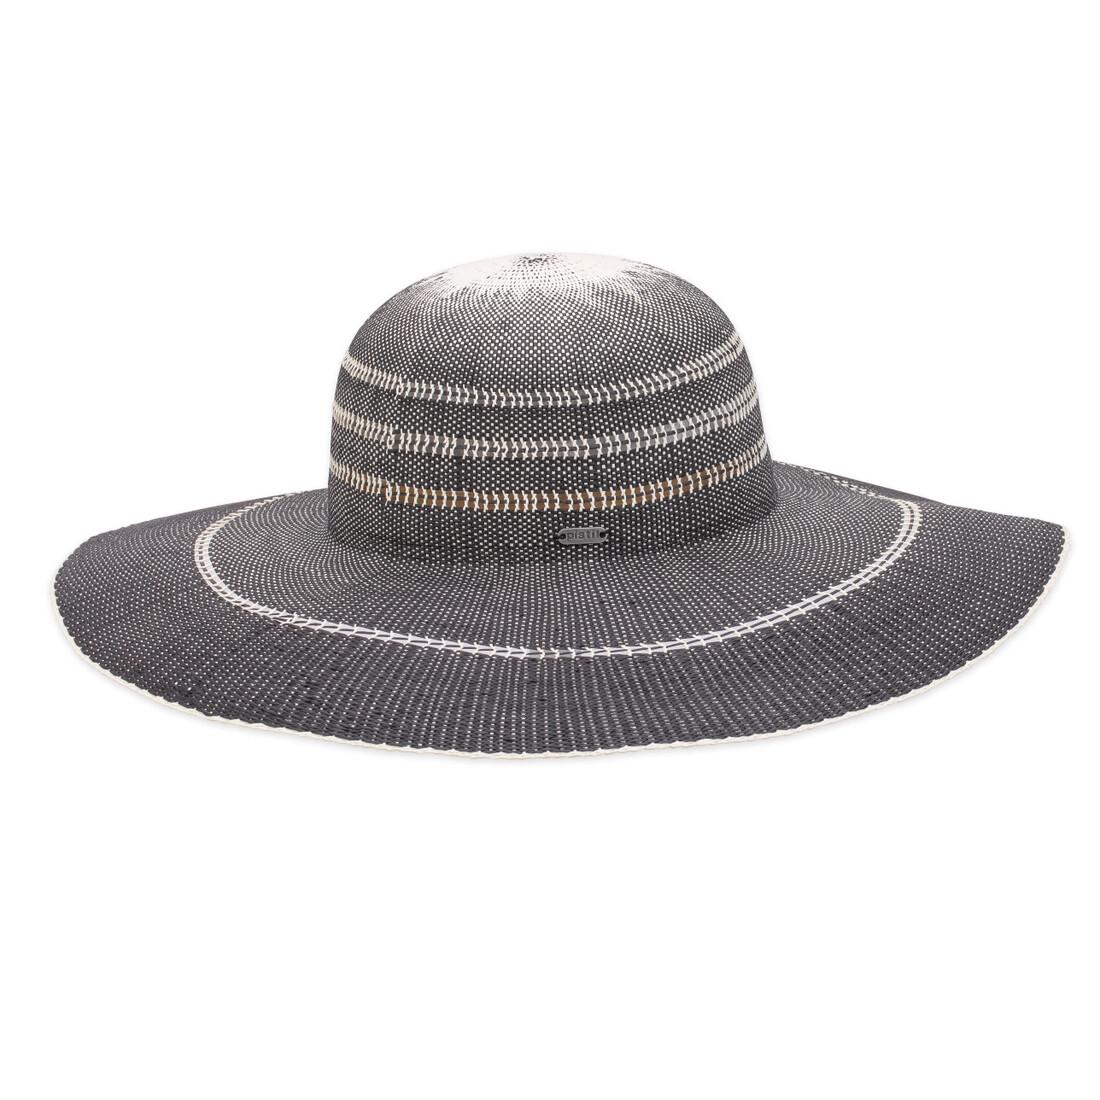 Pistil Designs, Cove Sun Hat, Black